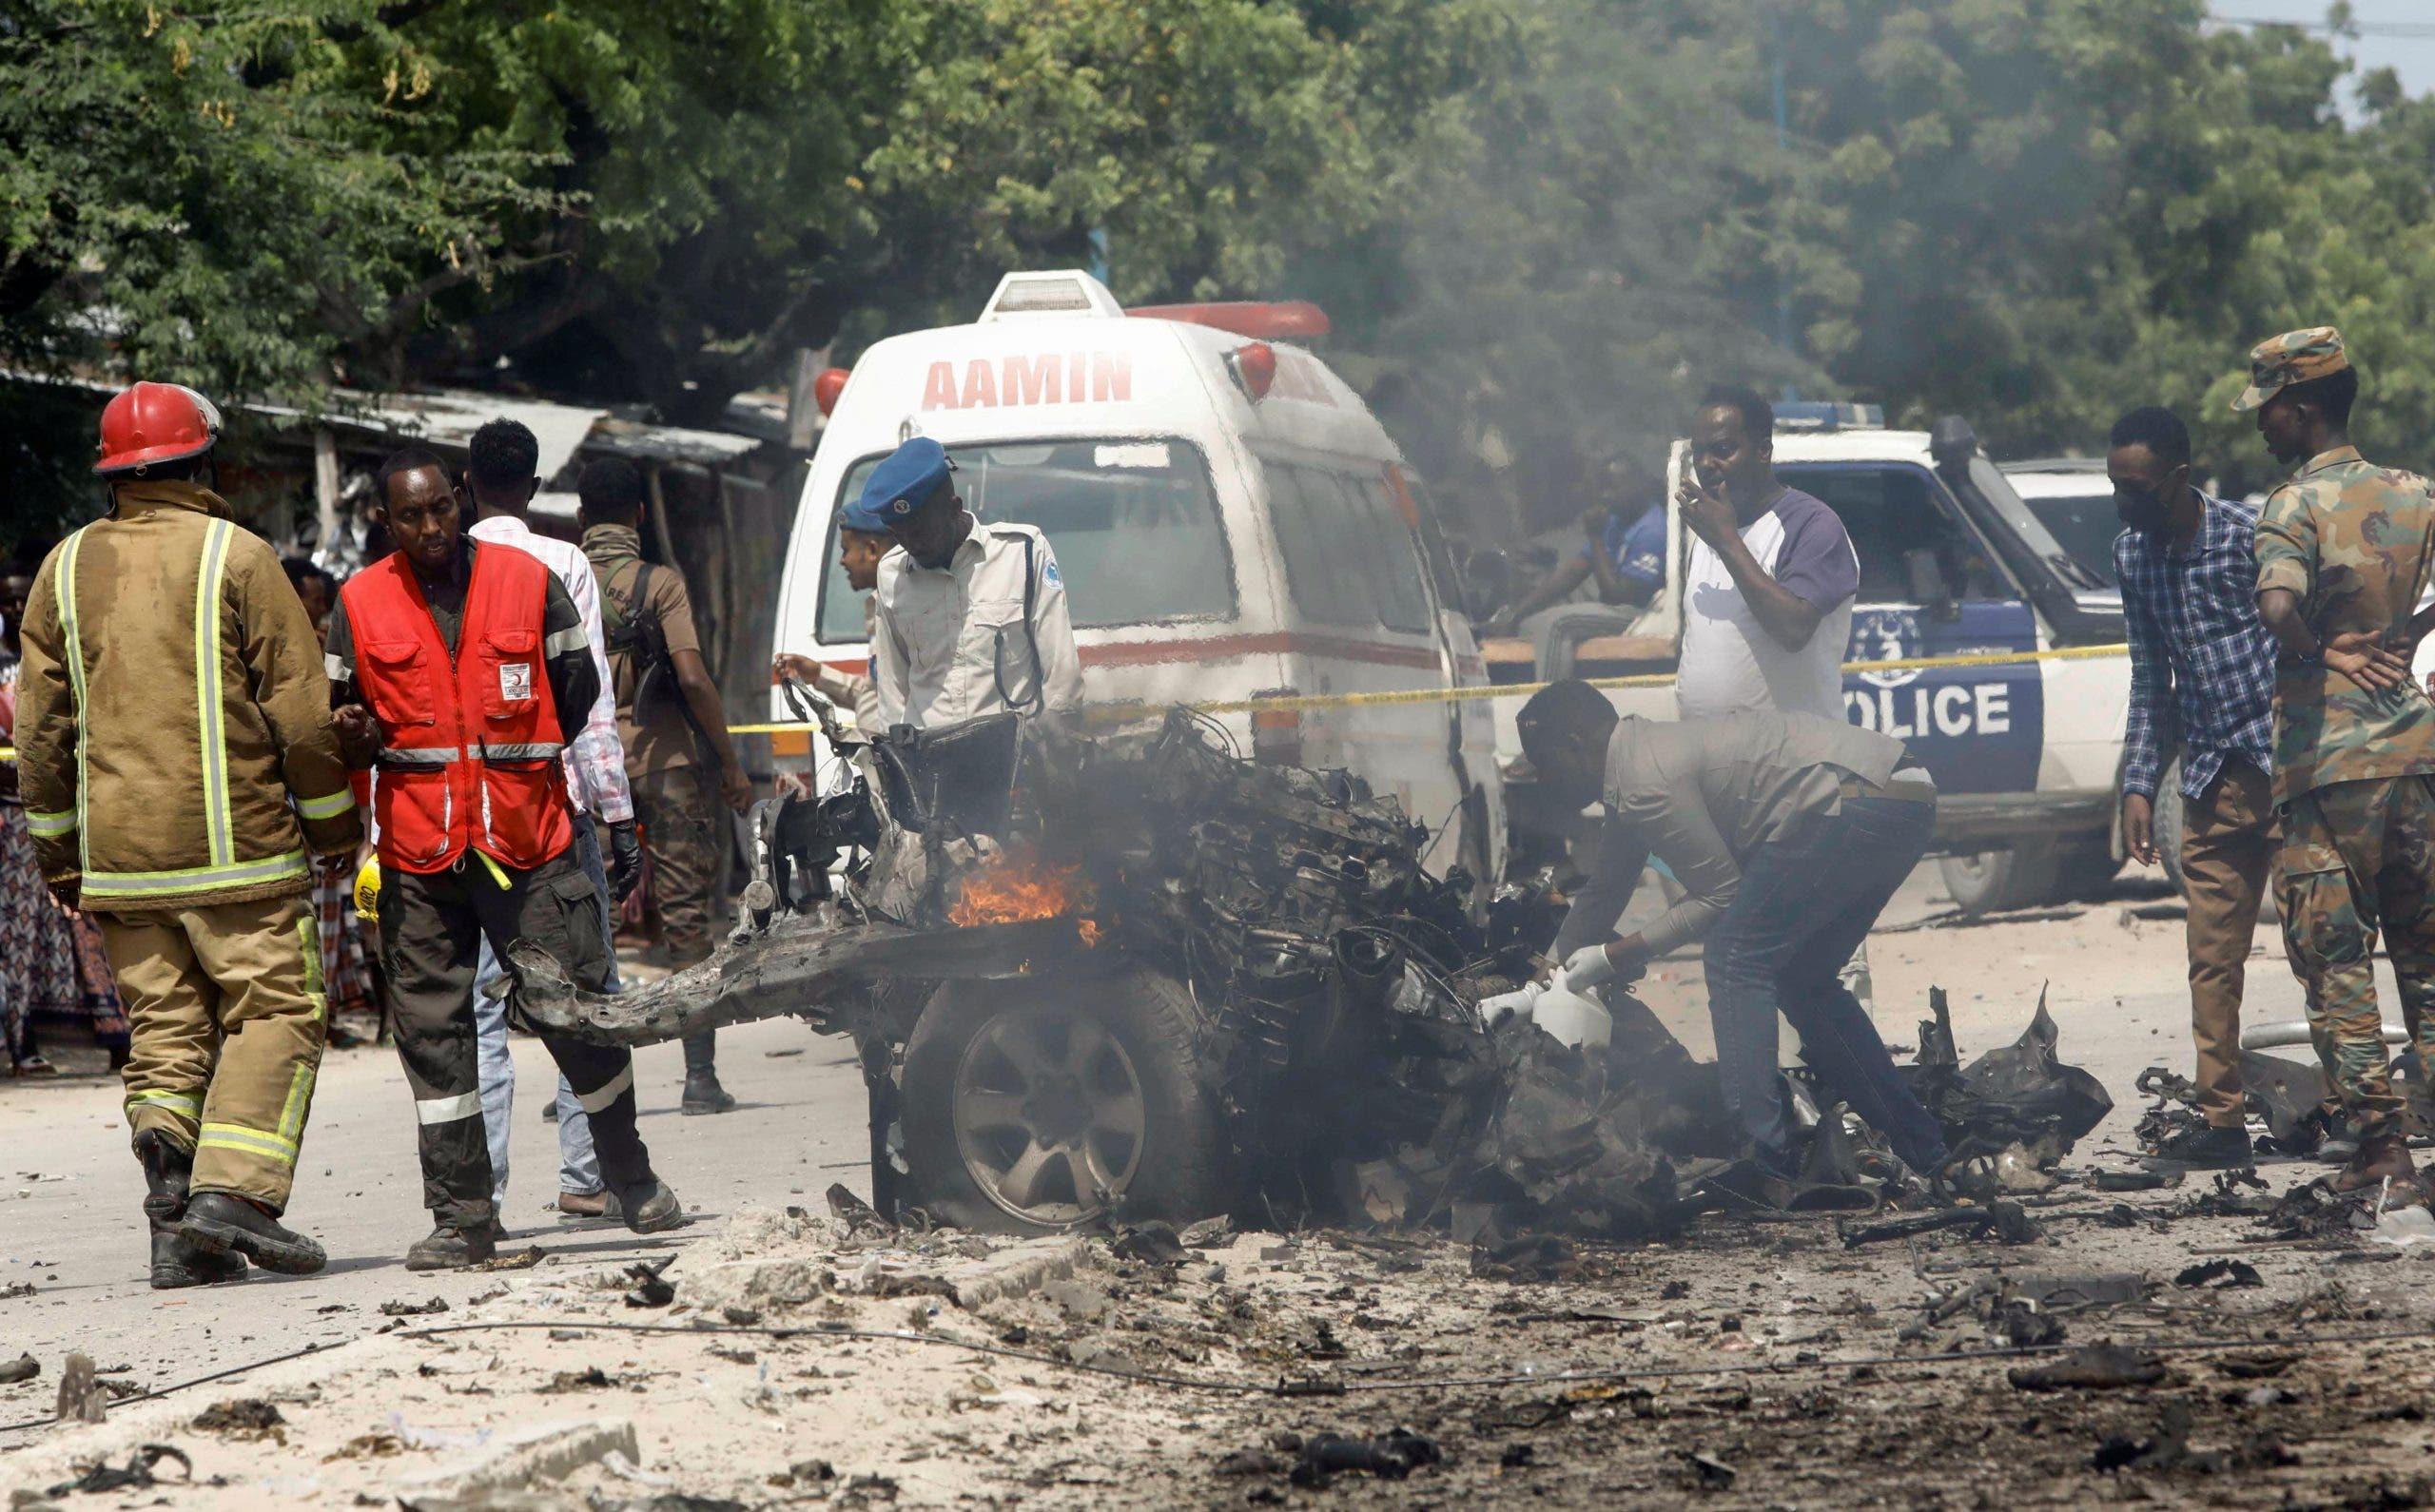 Extremist attack in Somalia's capital kills at least 9